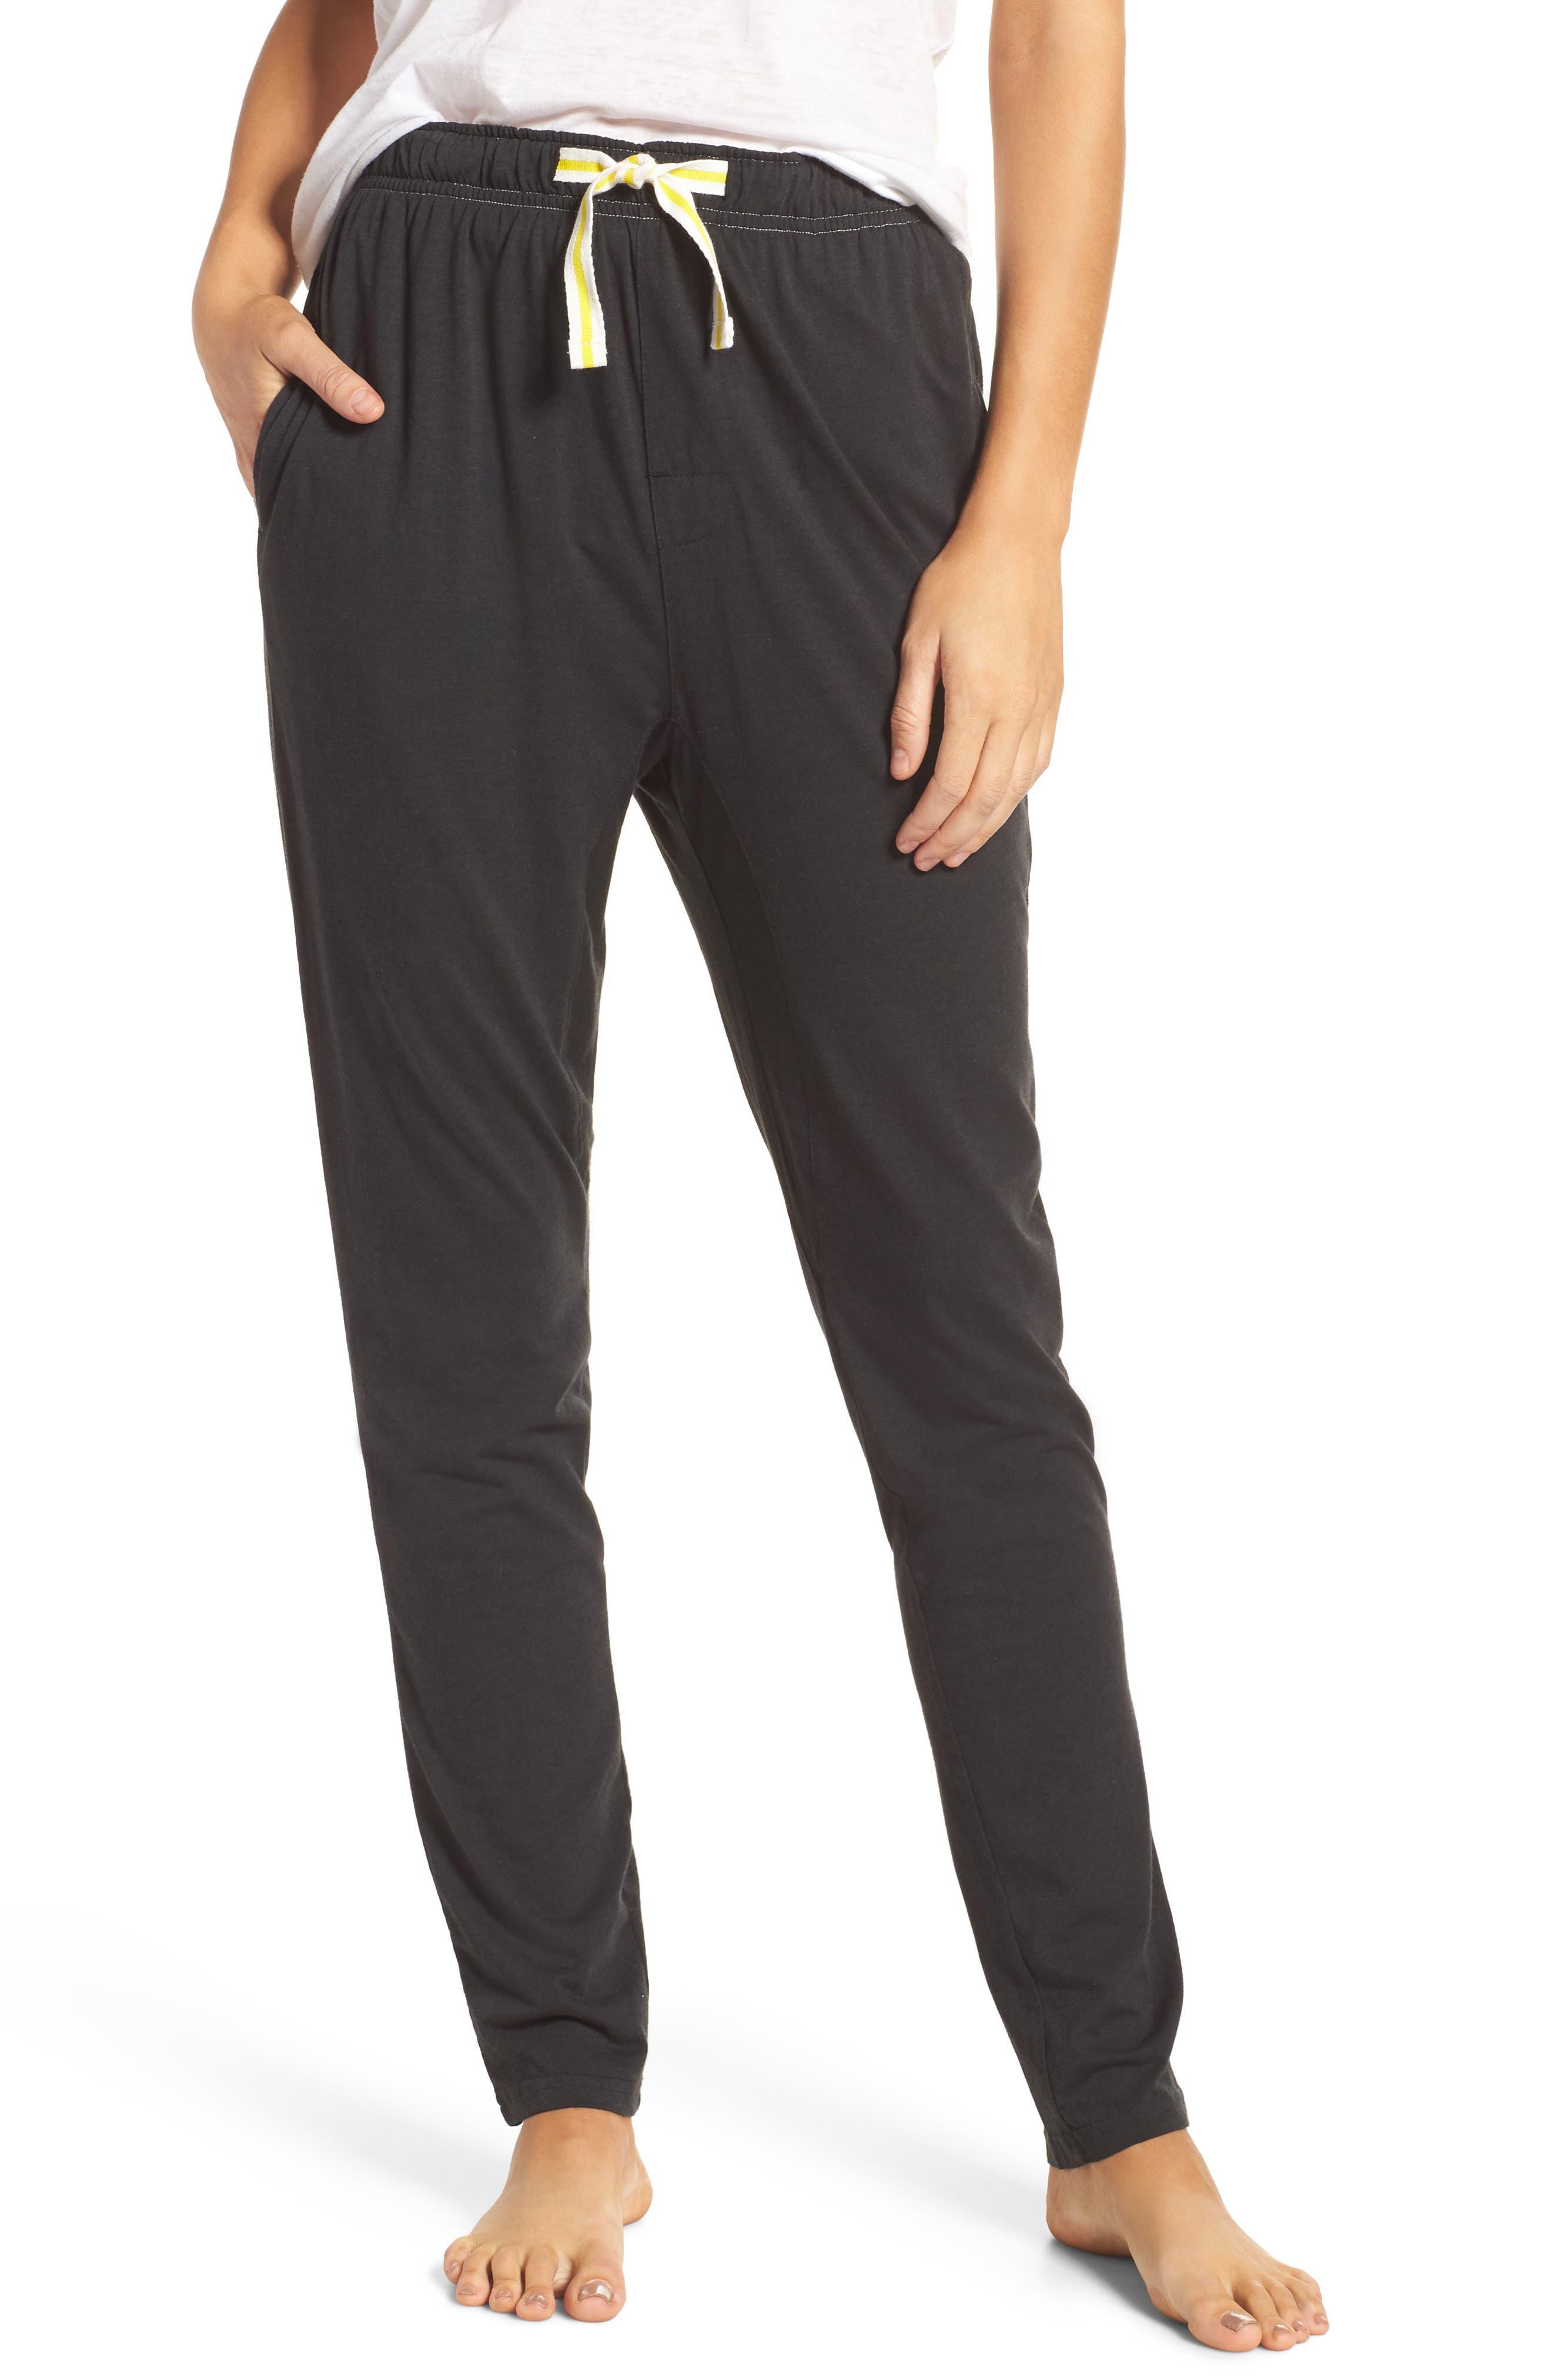 Alice Lounge Pants,                             Main thumbnail 1, color,                             Plain Black Marle